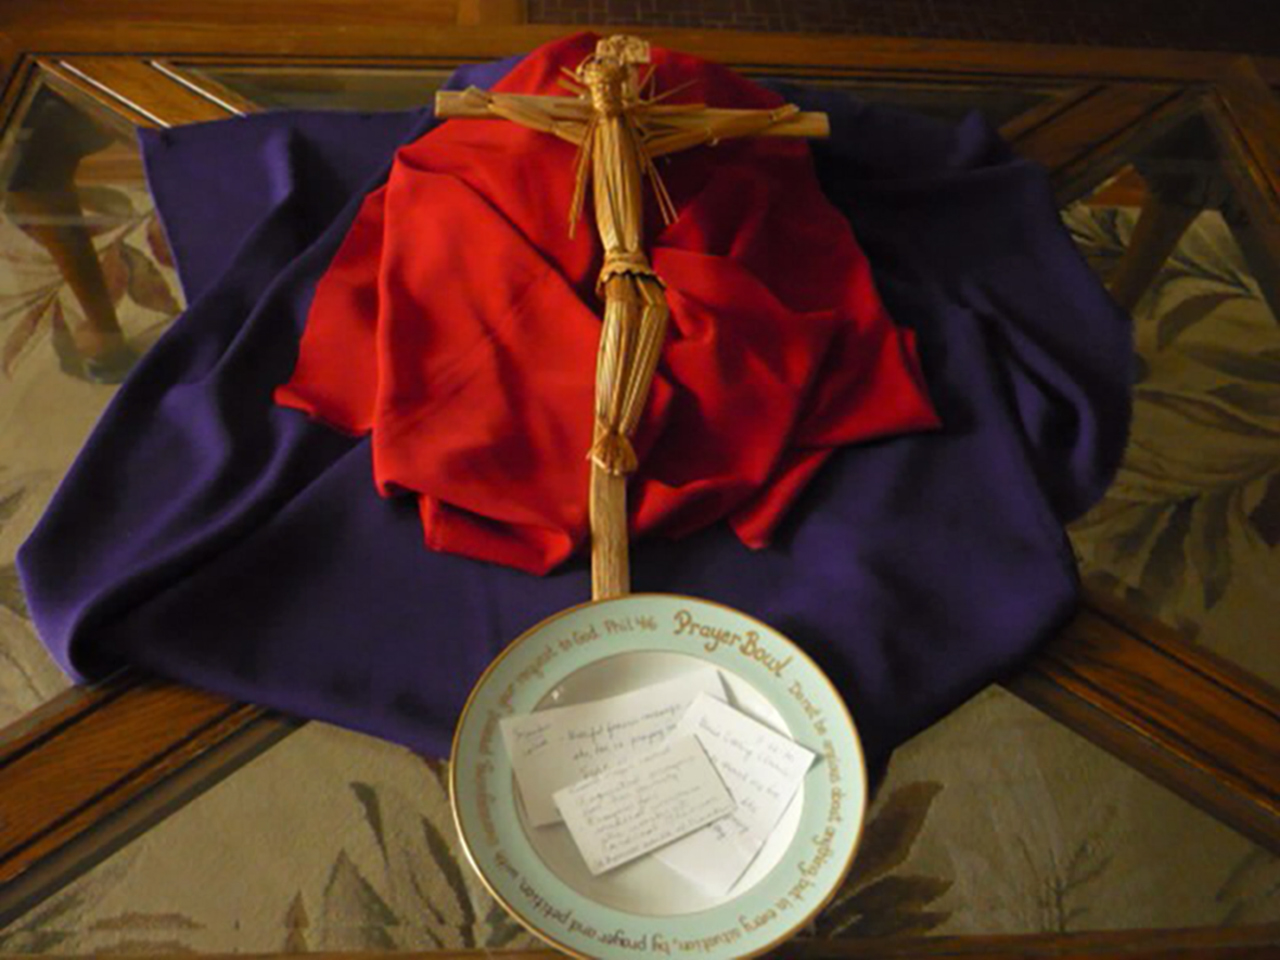 Fairdale Prayer Bowl